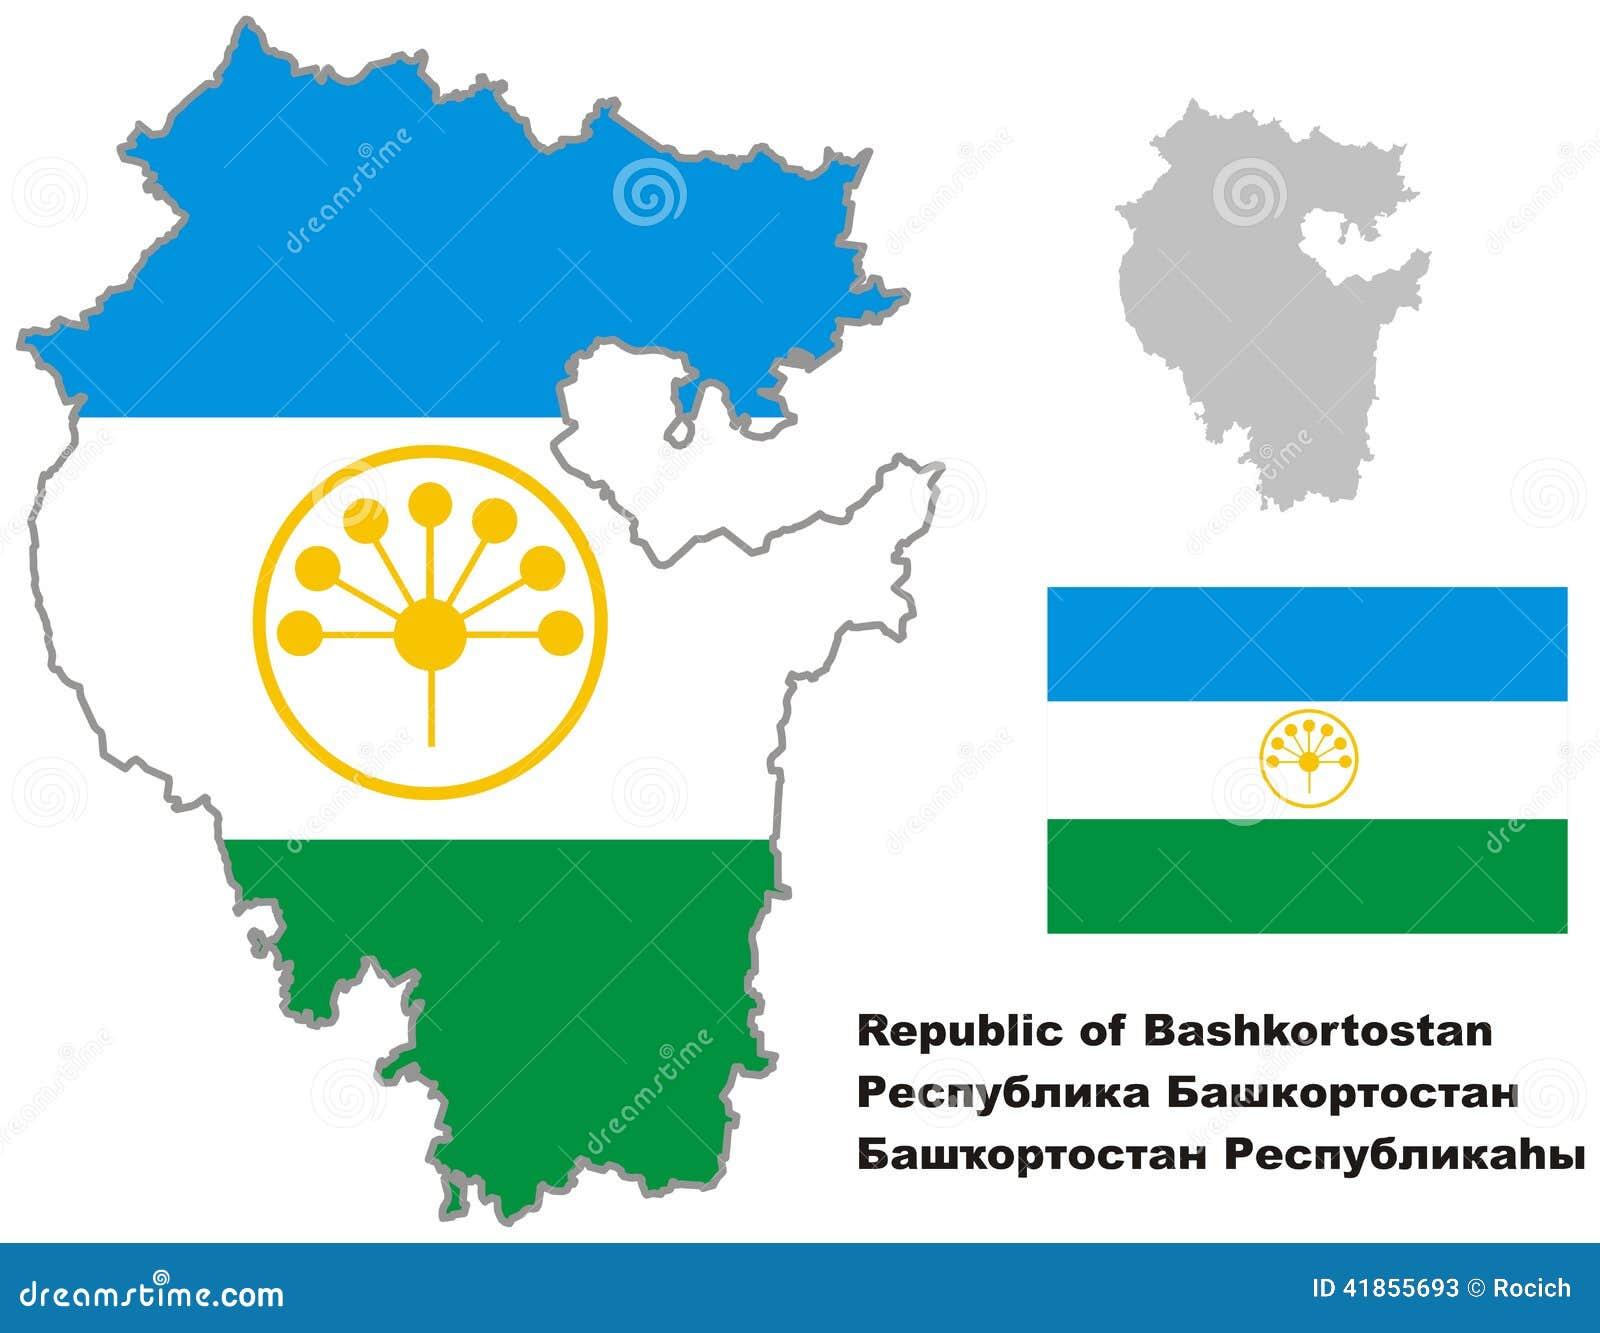 Outline Map Of Bashkortostan With Flag Stock Vector Illustration